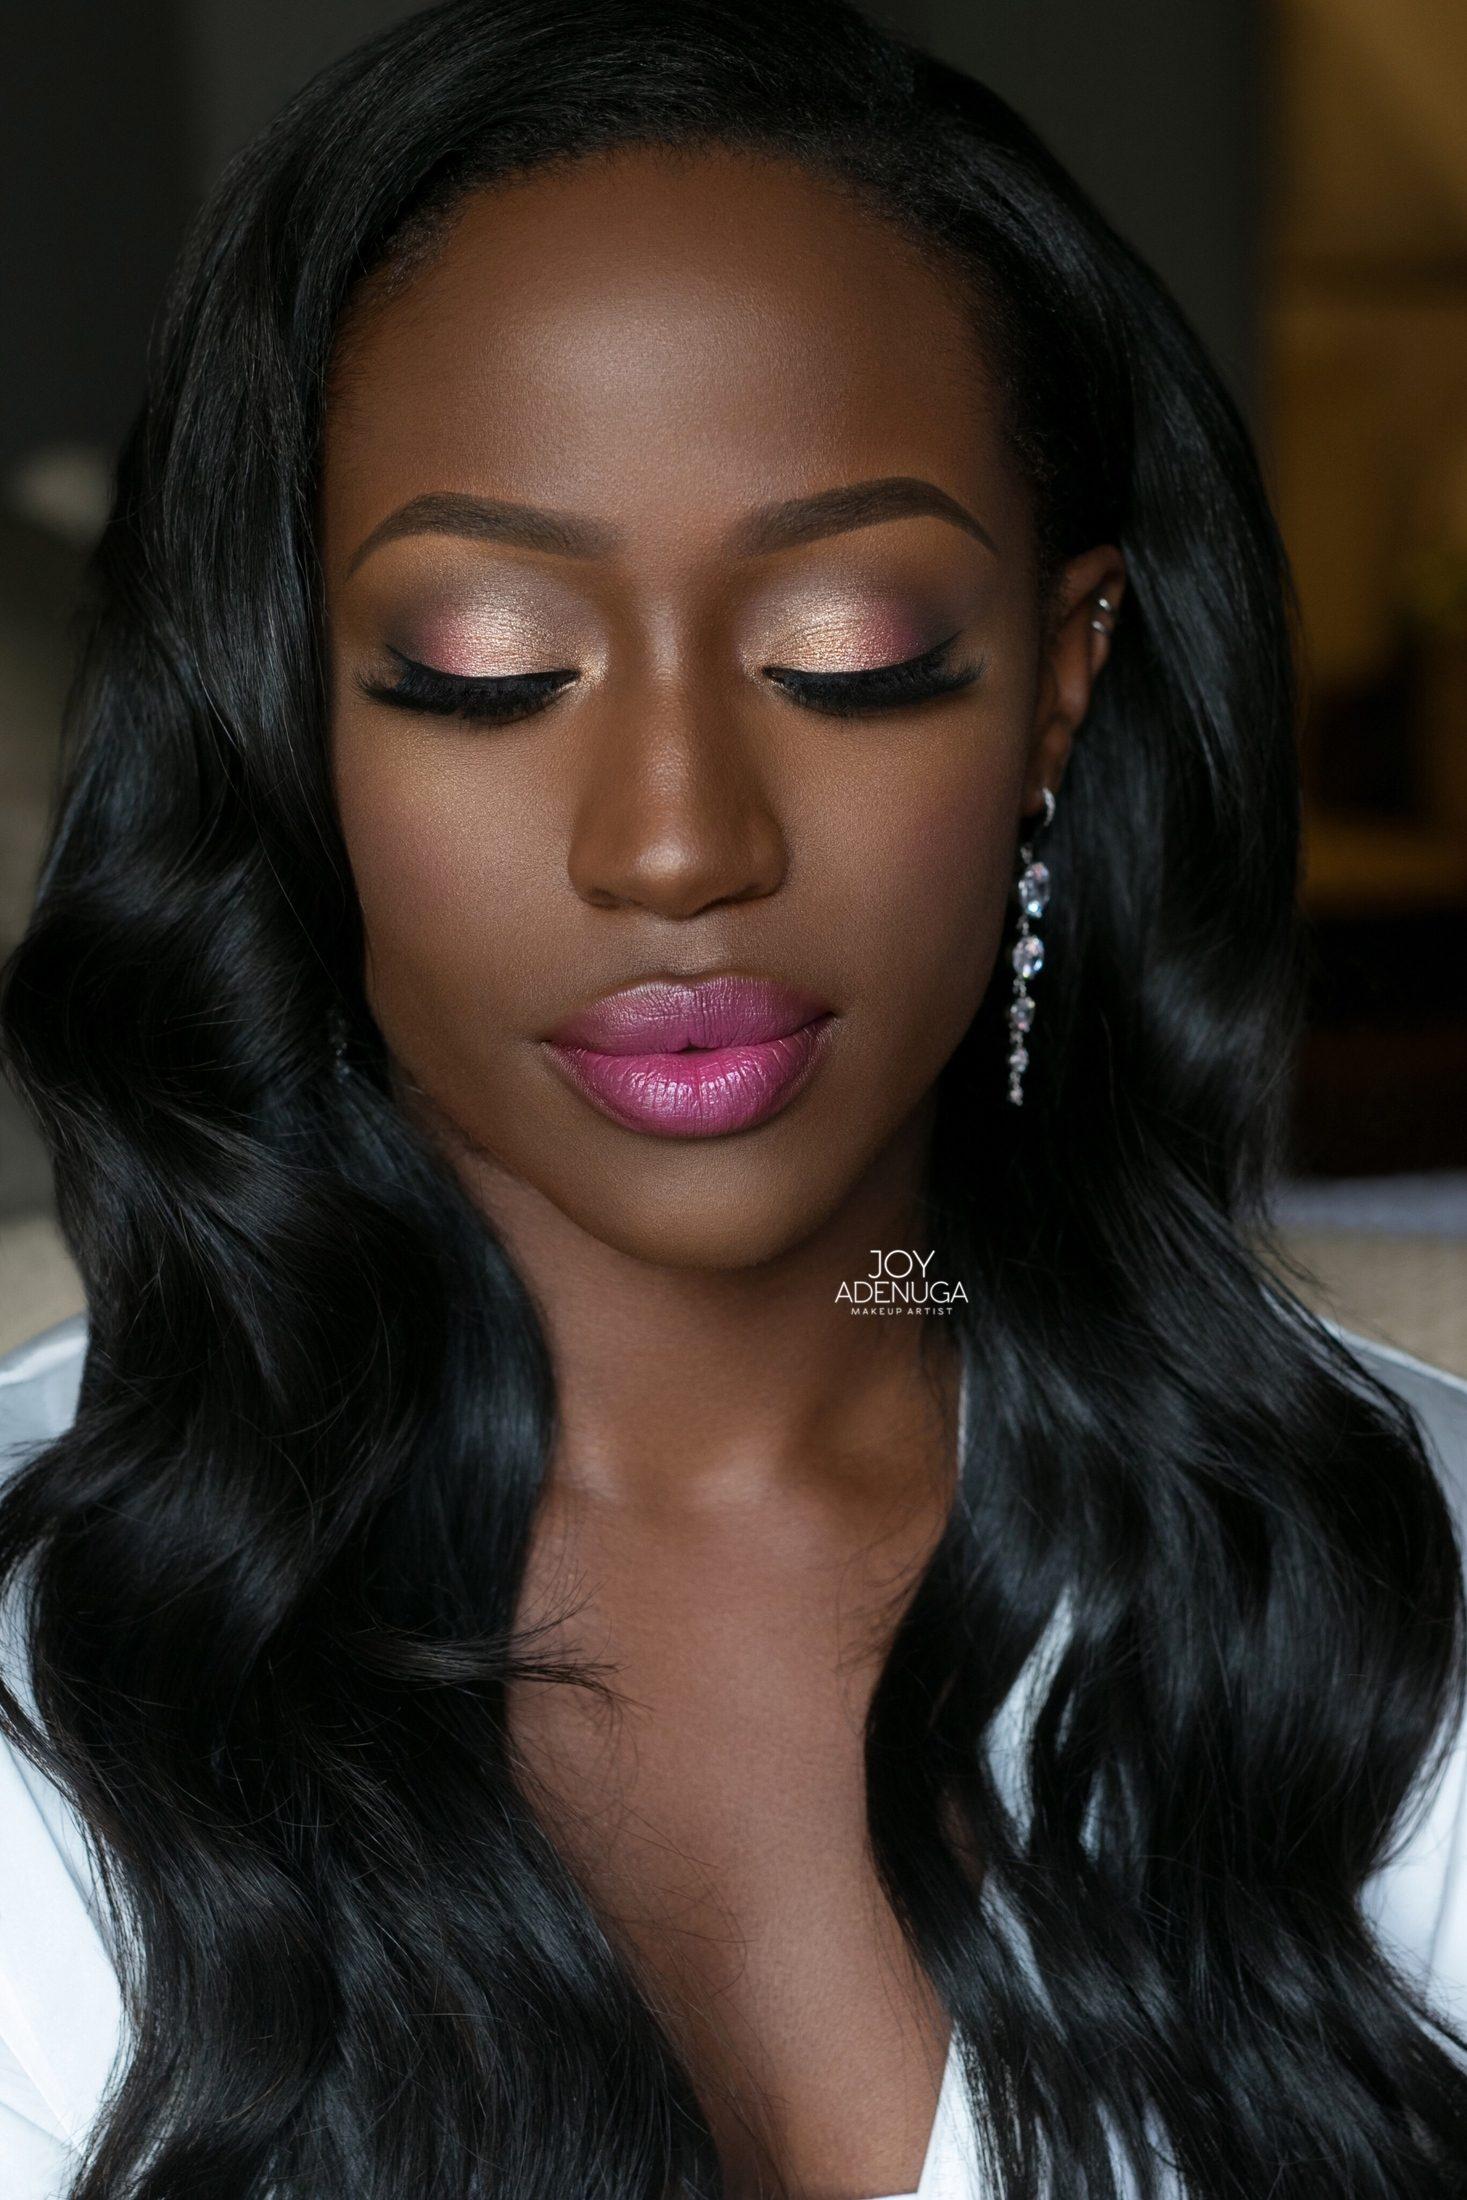 Nicole's Wedding, joy adenuga, Nigerian makeup artist, black bride, black bridal blog london, london black makeup artist, london makeup artist for black skin, black bridal makeup artist london, makeup artist for black skin, nigerian makeup artist london, makeup artist for women of colour, Rwandan bride